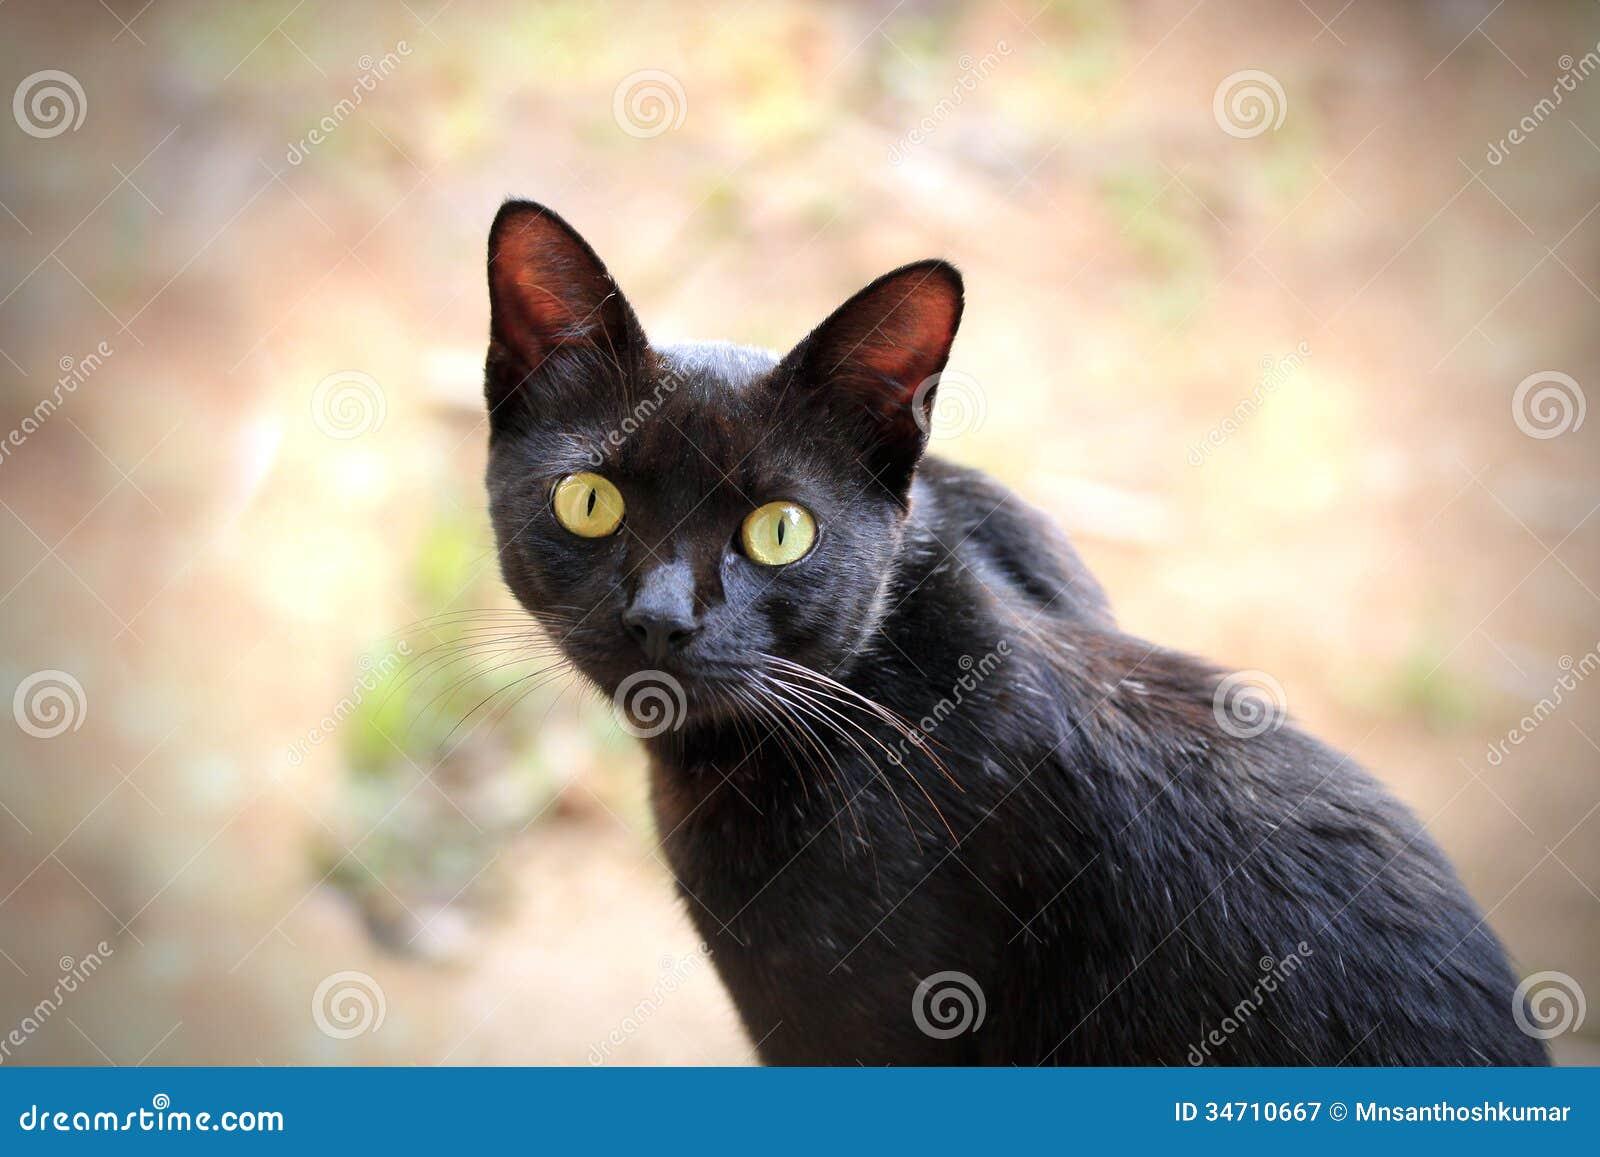 Beautiful black cat with expressive hazel eyes staring